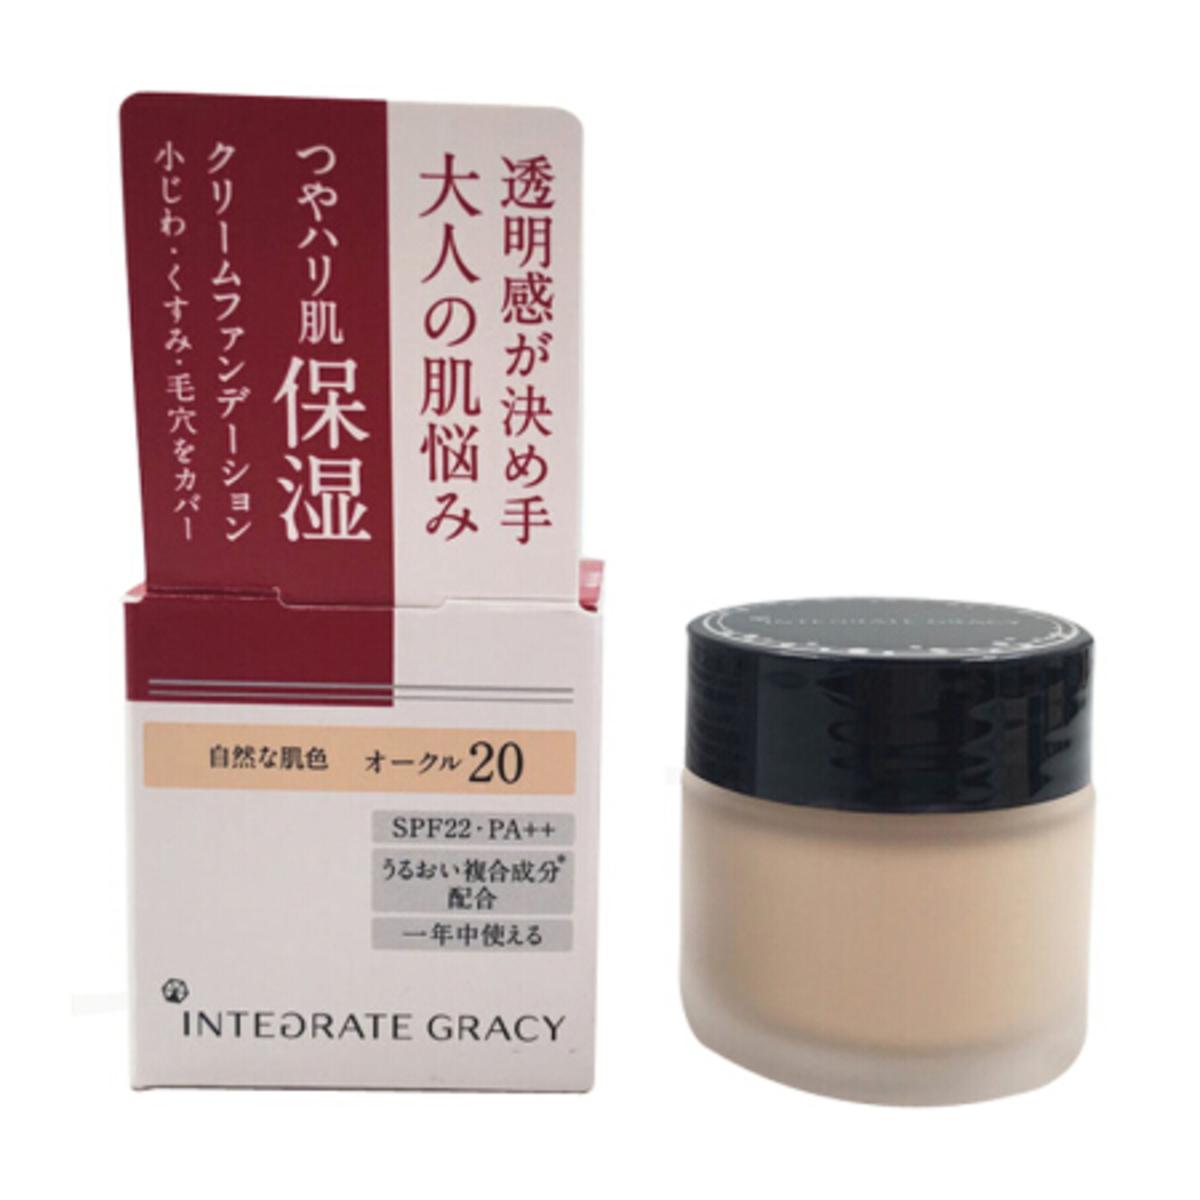 Integrate Gracy 完美意境保濕粉霜 粉底霜 25g OC-20 自然膚色